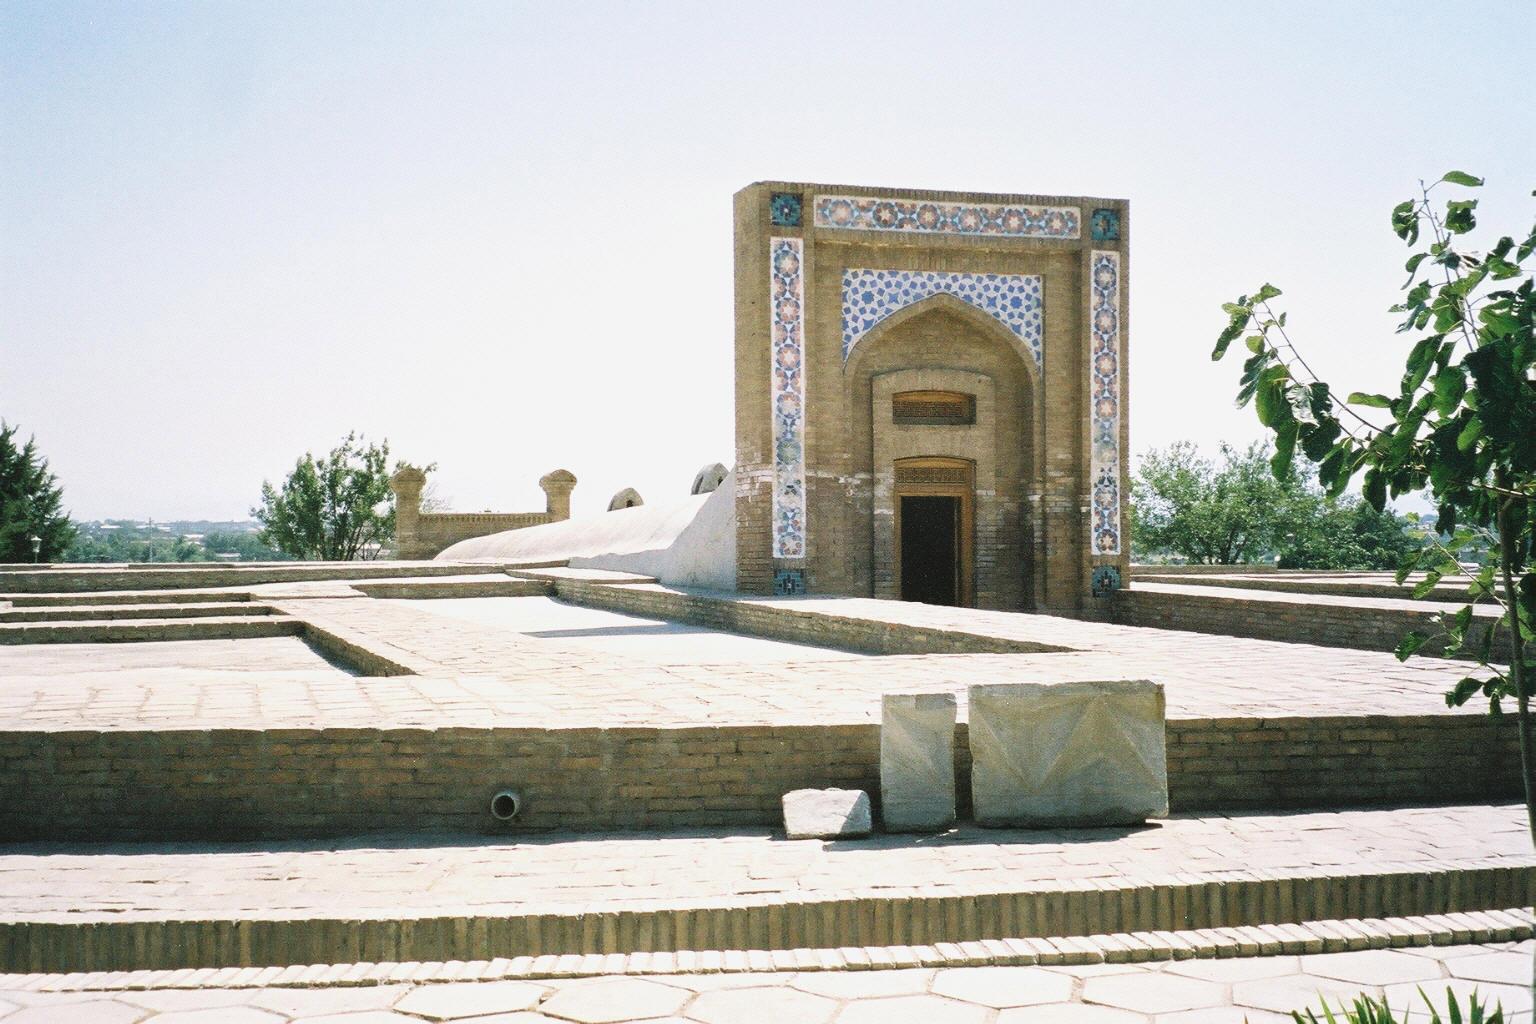 1567216246269-Samarkand_observatory_Ulugh_Beg.jpg